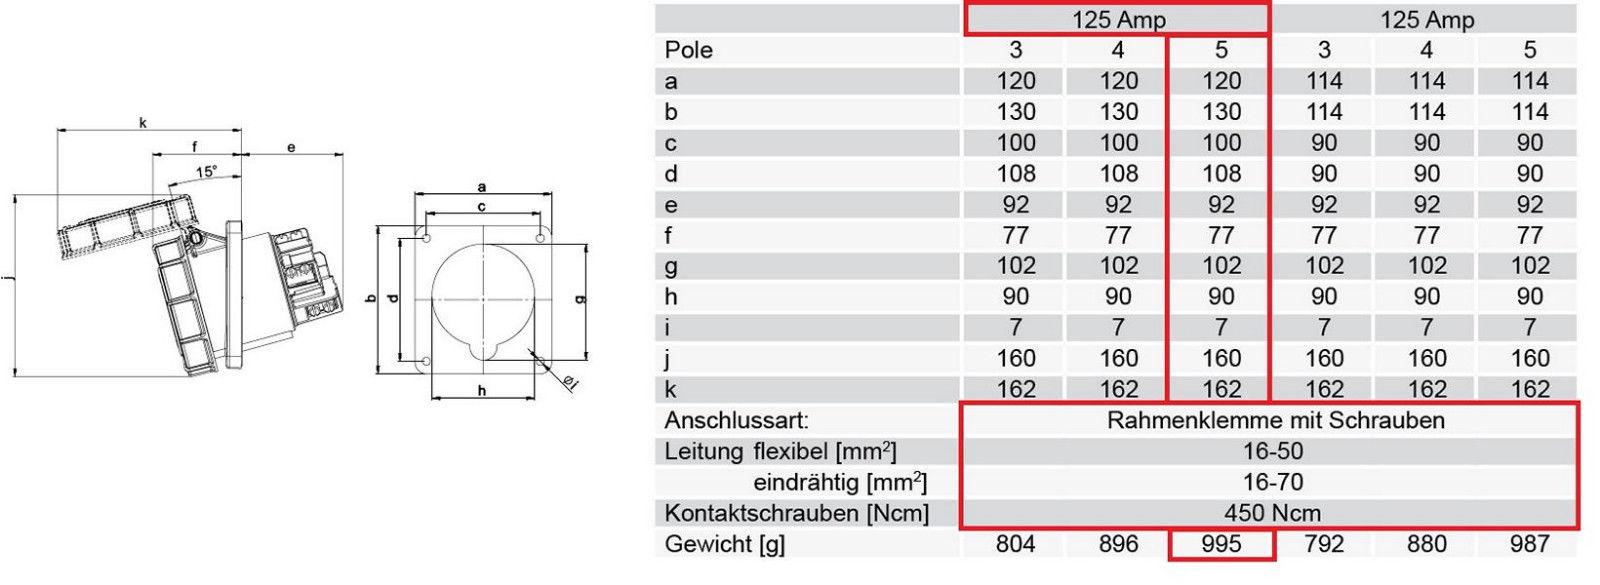 BK10 Bügelbild Bügeltransfer Aquarell Sugar Wolf Ethno DIN A4 A5 helle Stoffe